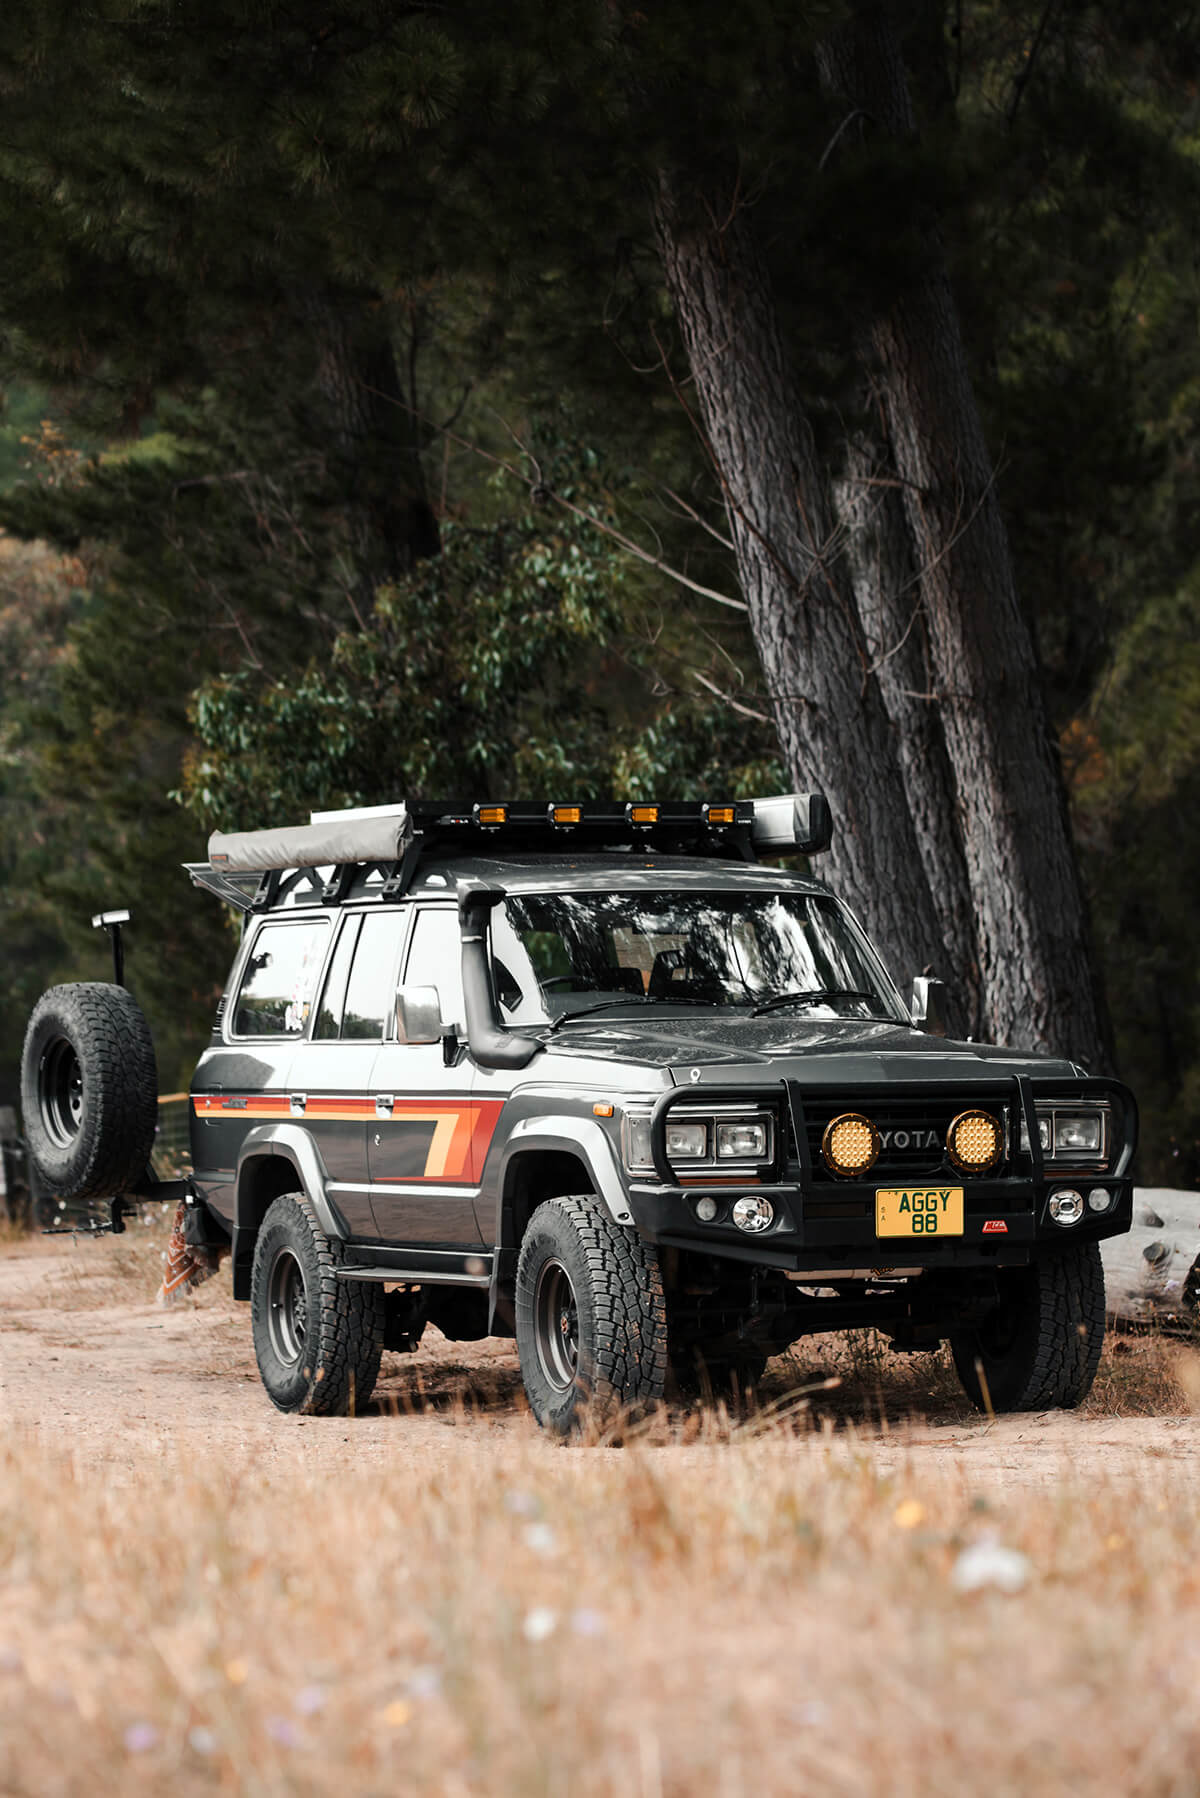 Rhino roof bars – Rola Titan flat rack